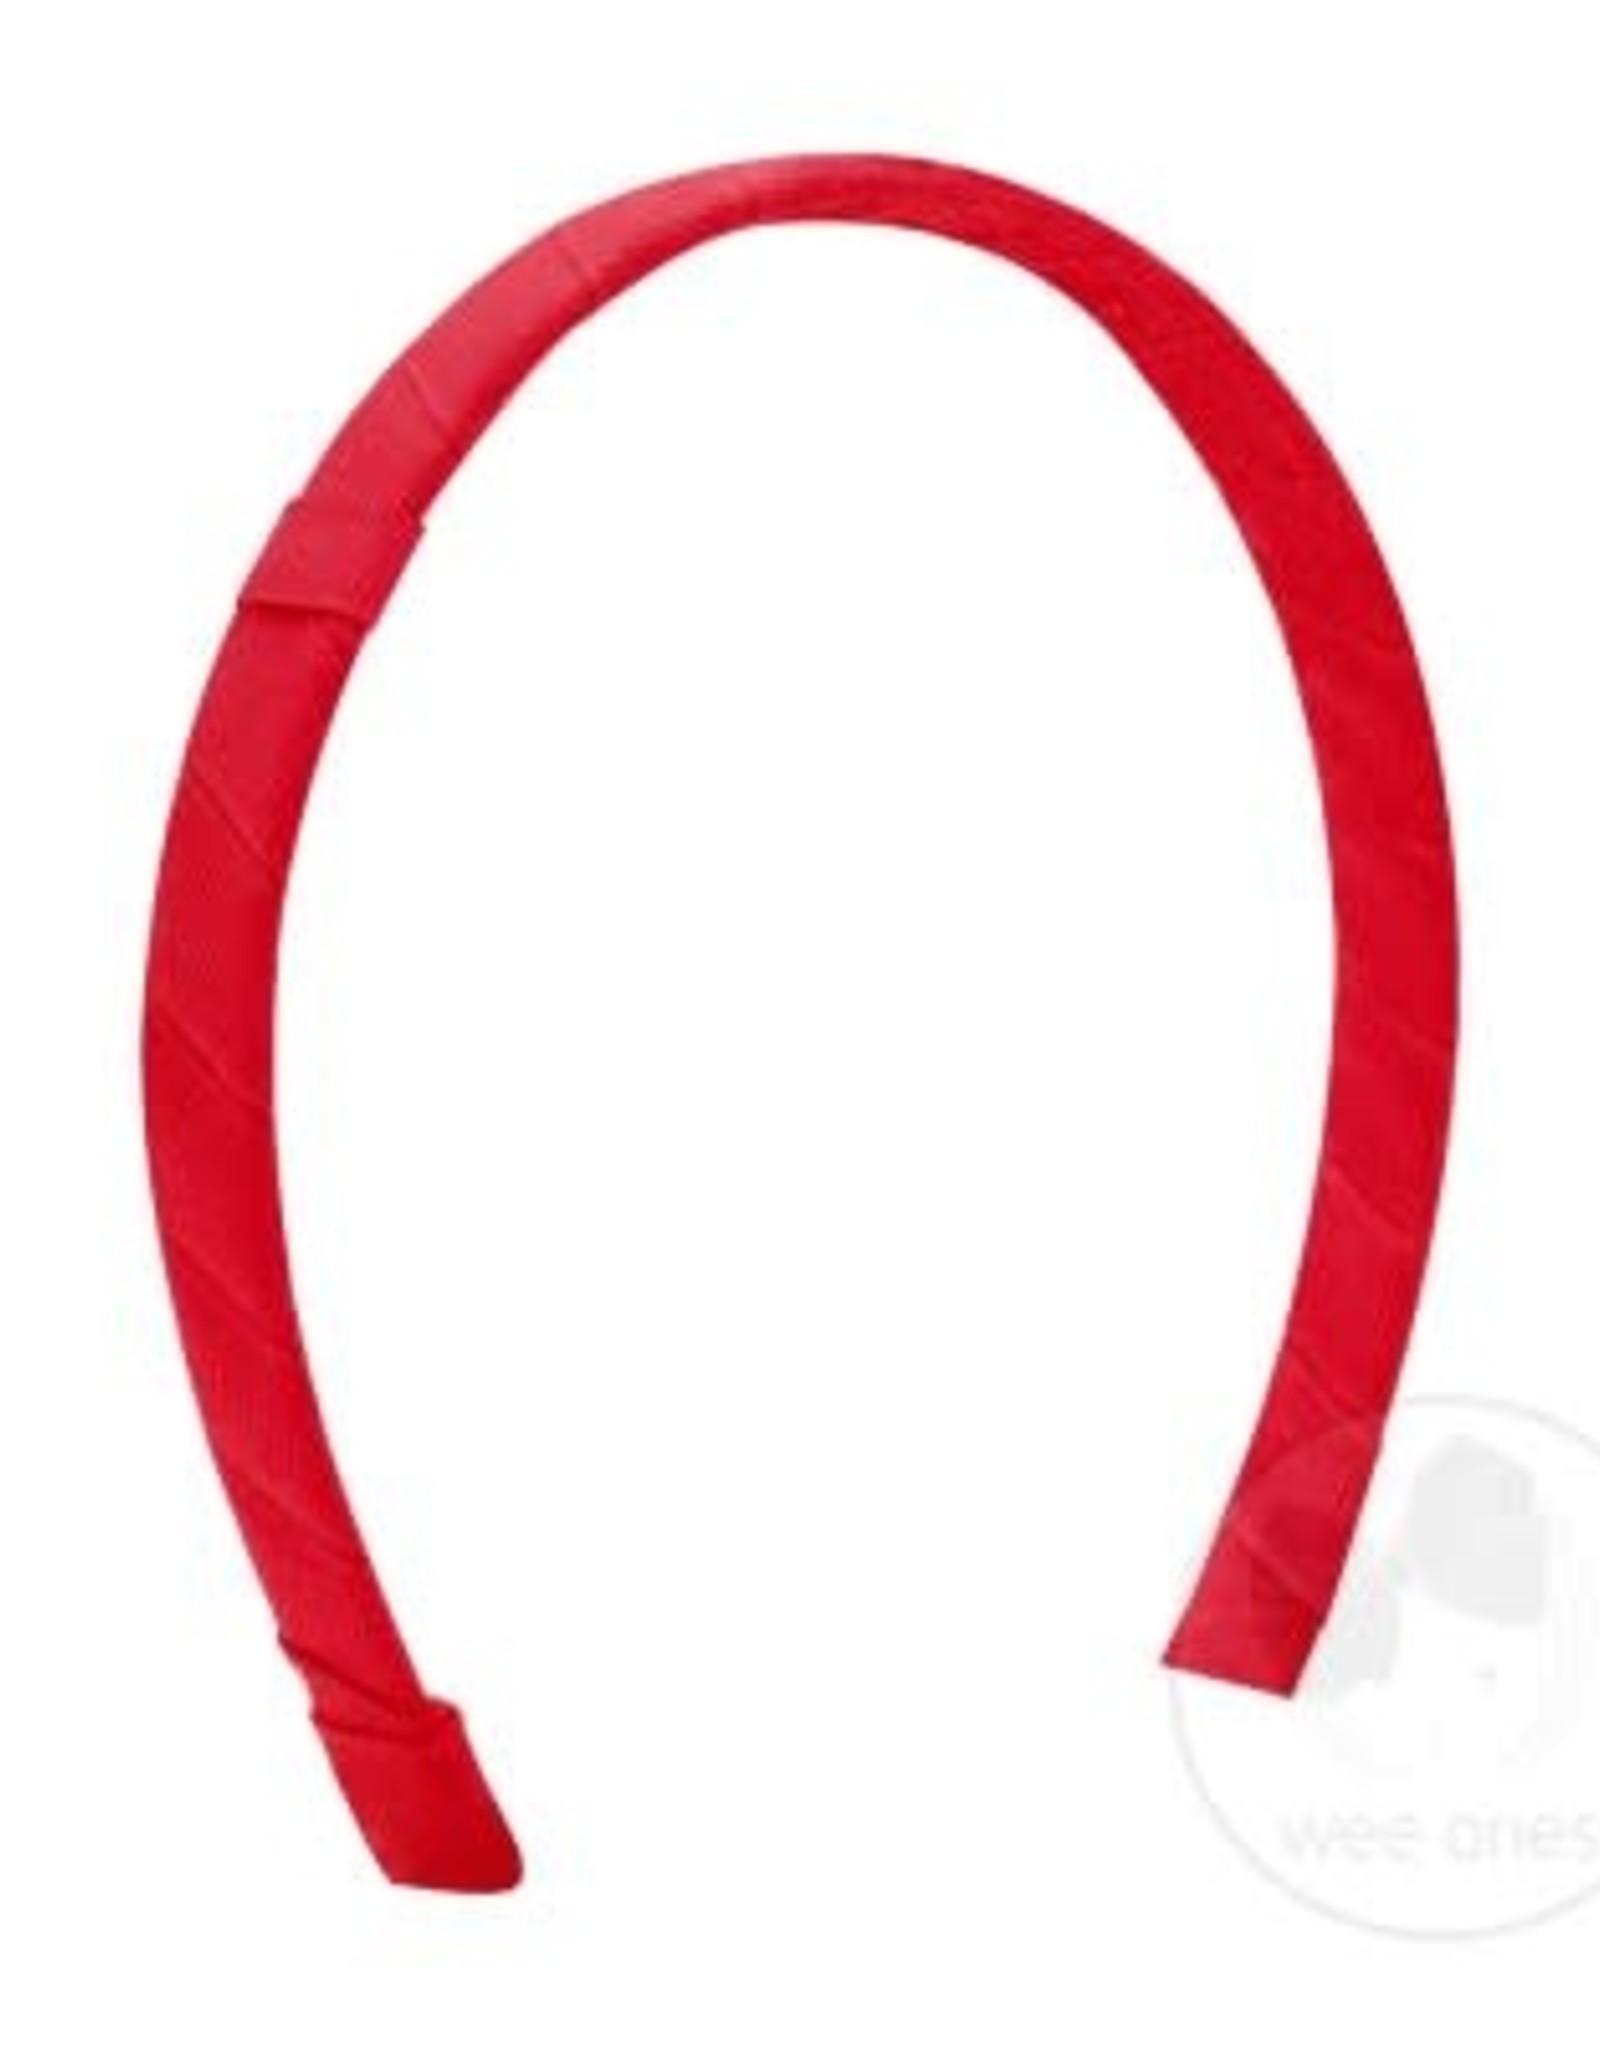 WeeOnes Grosgrain Add-a-Bow Headband Red